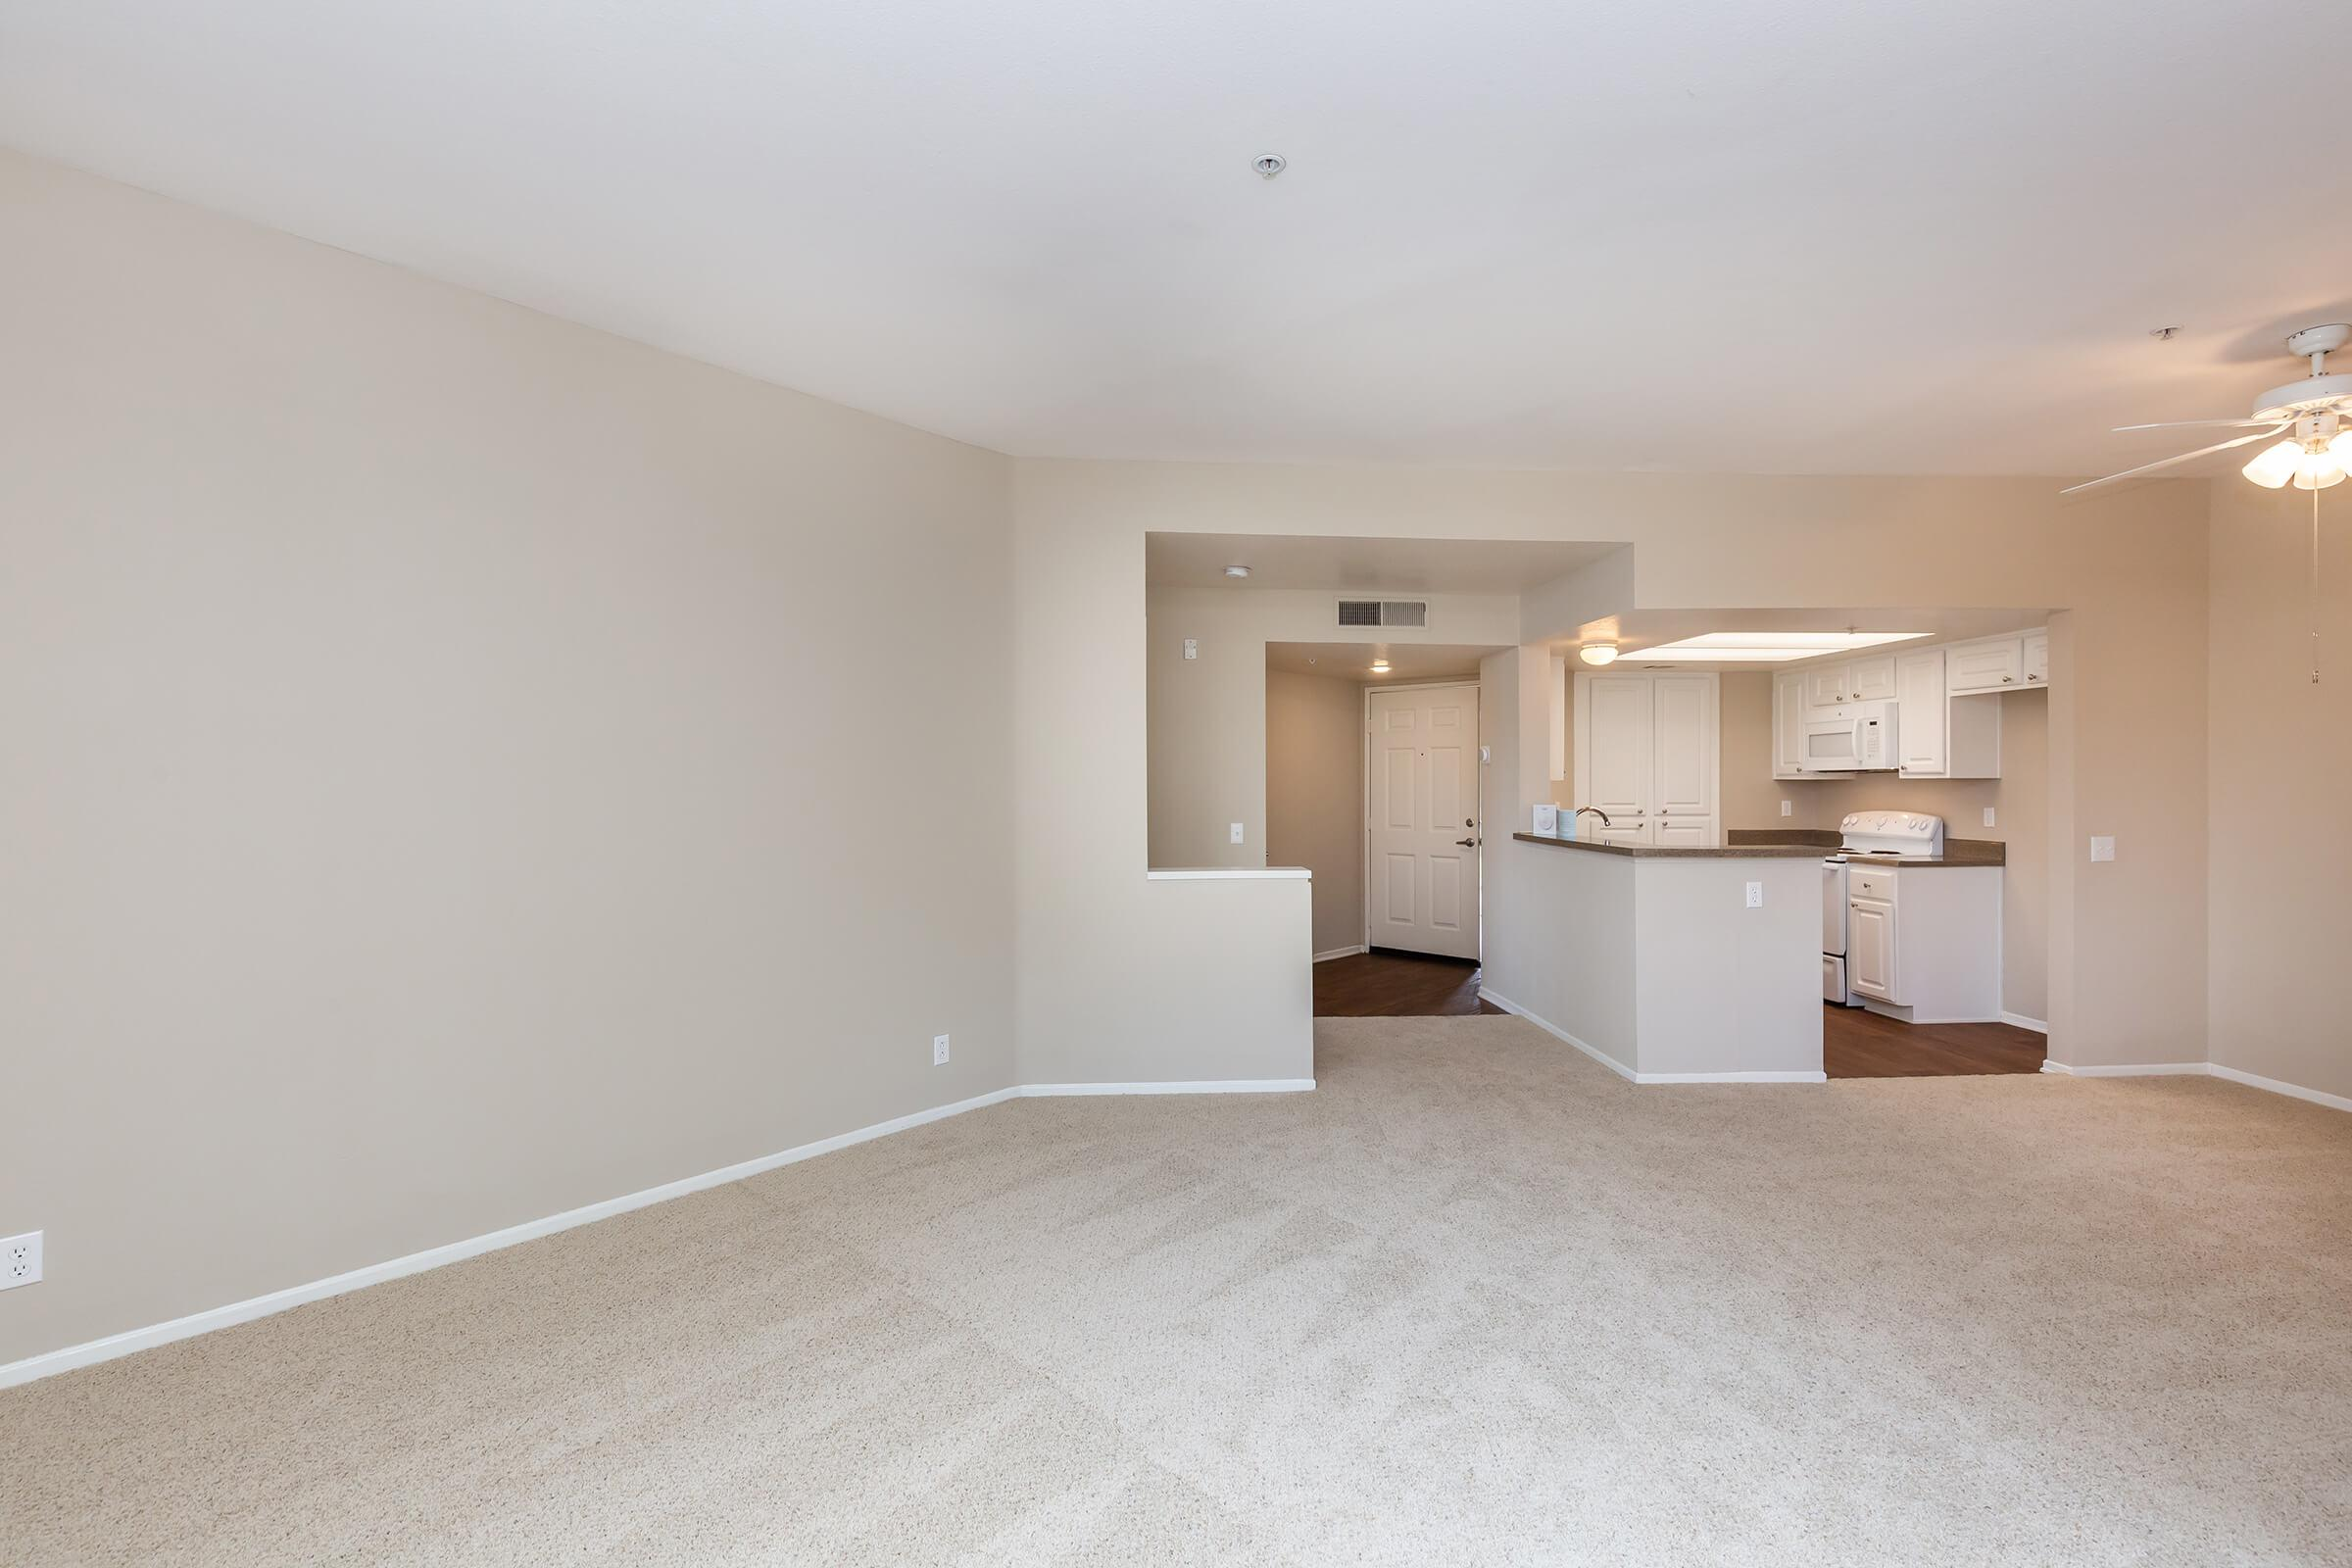 Unfurnished carpeted living room